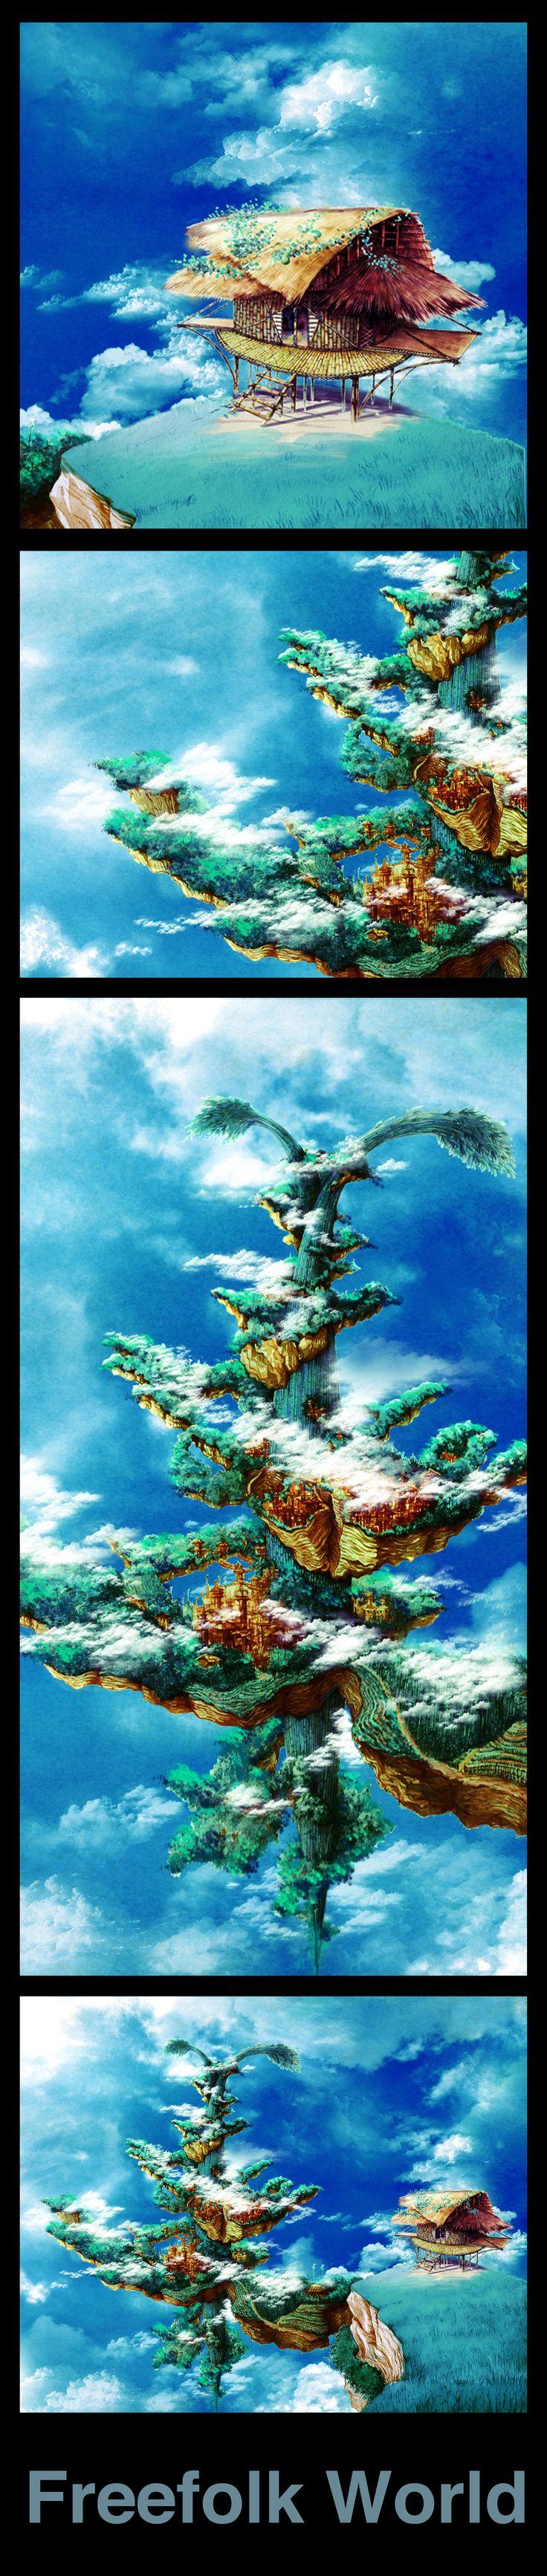 #BambooVillage #GiantBamboo #Hut #FlyingMountain #clouds #watercolor #conceptart #BlueGreen #blueSky #laputa